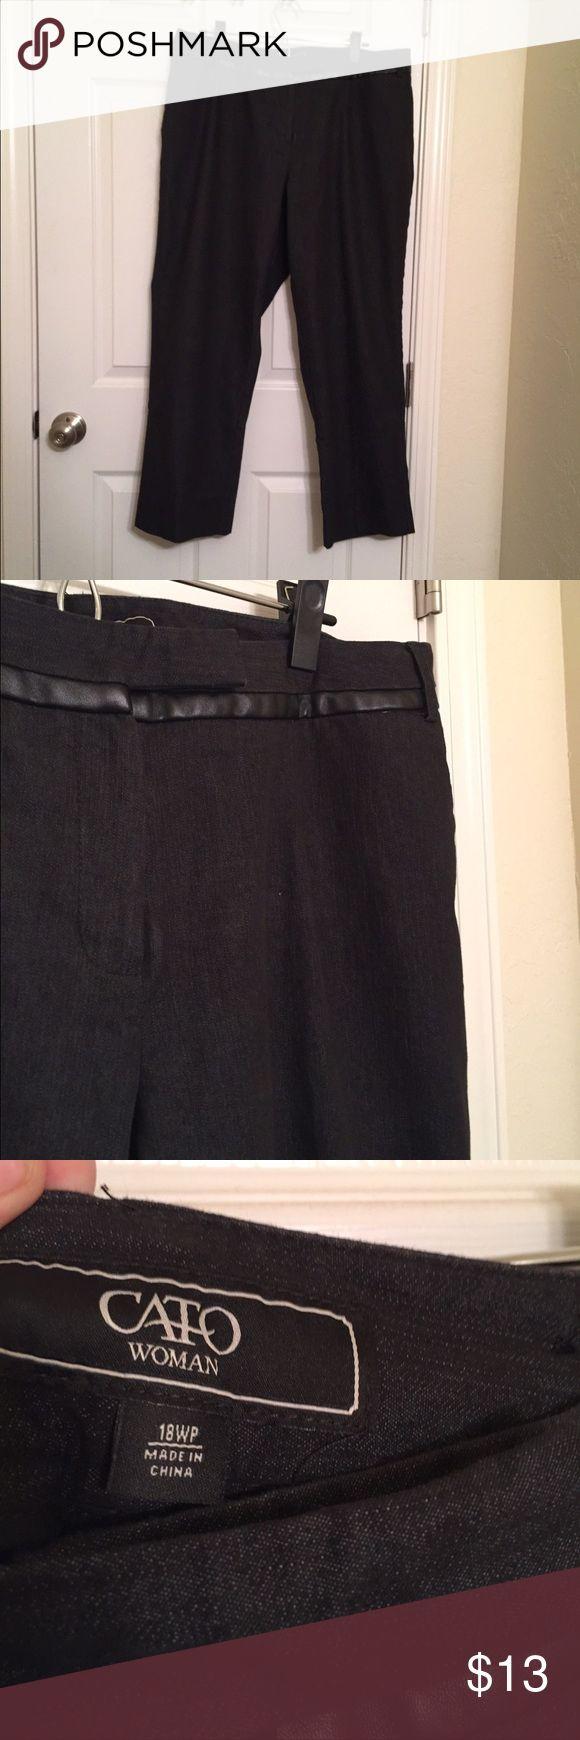 Black denim dress pants Cute black leather trim around waist, size 18W-petite Cato Pants